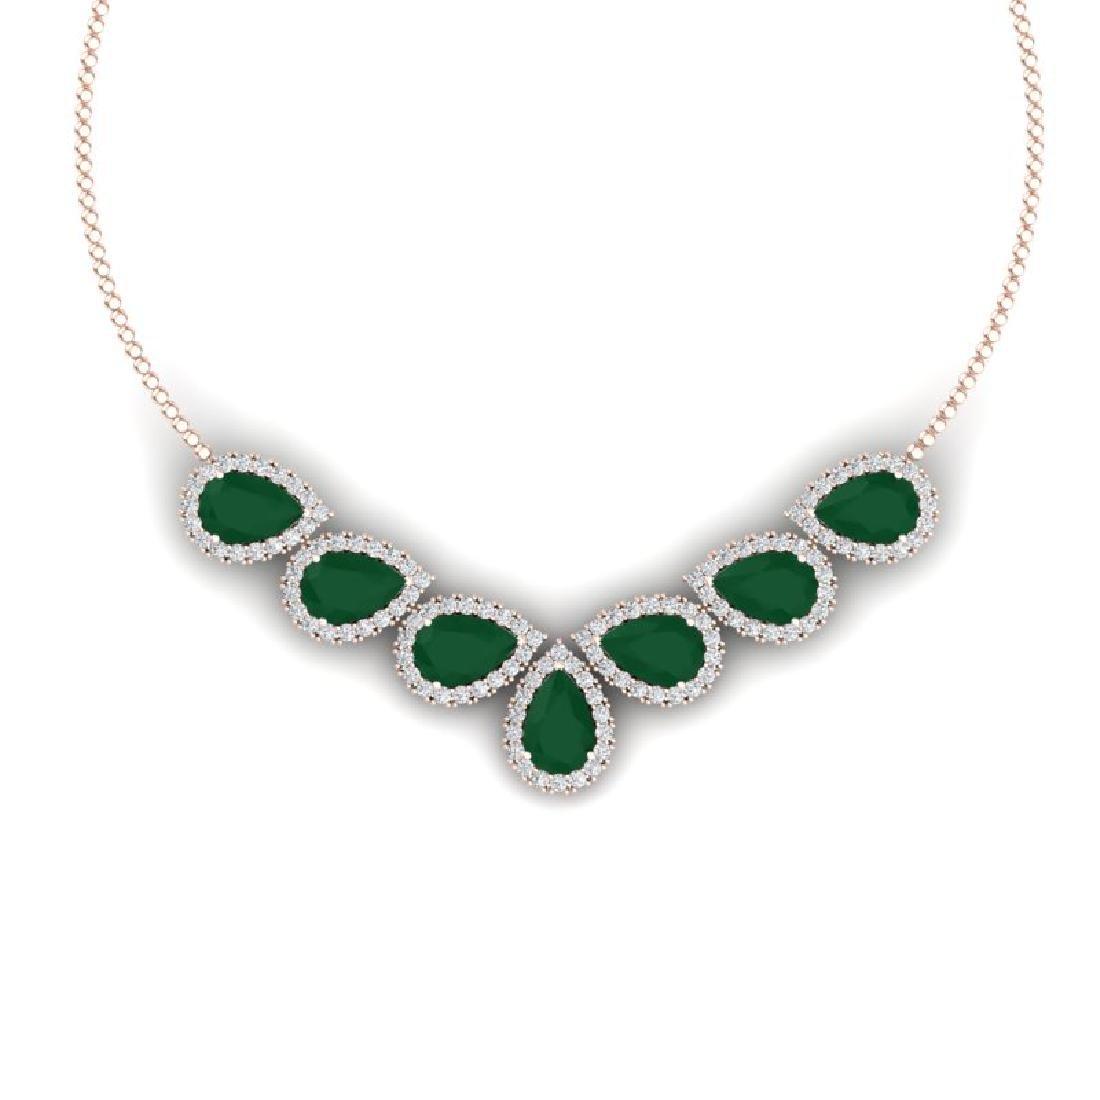 34.72 CTW Royalty Emerald & VS Diamond Necklace 18K